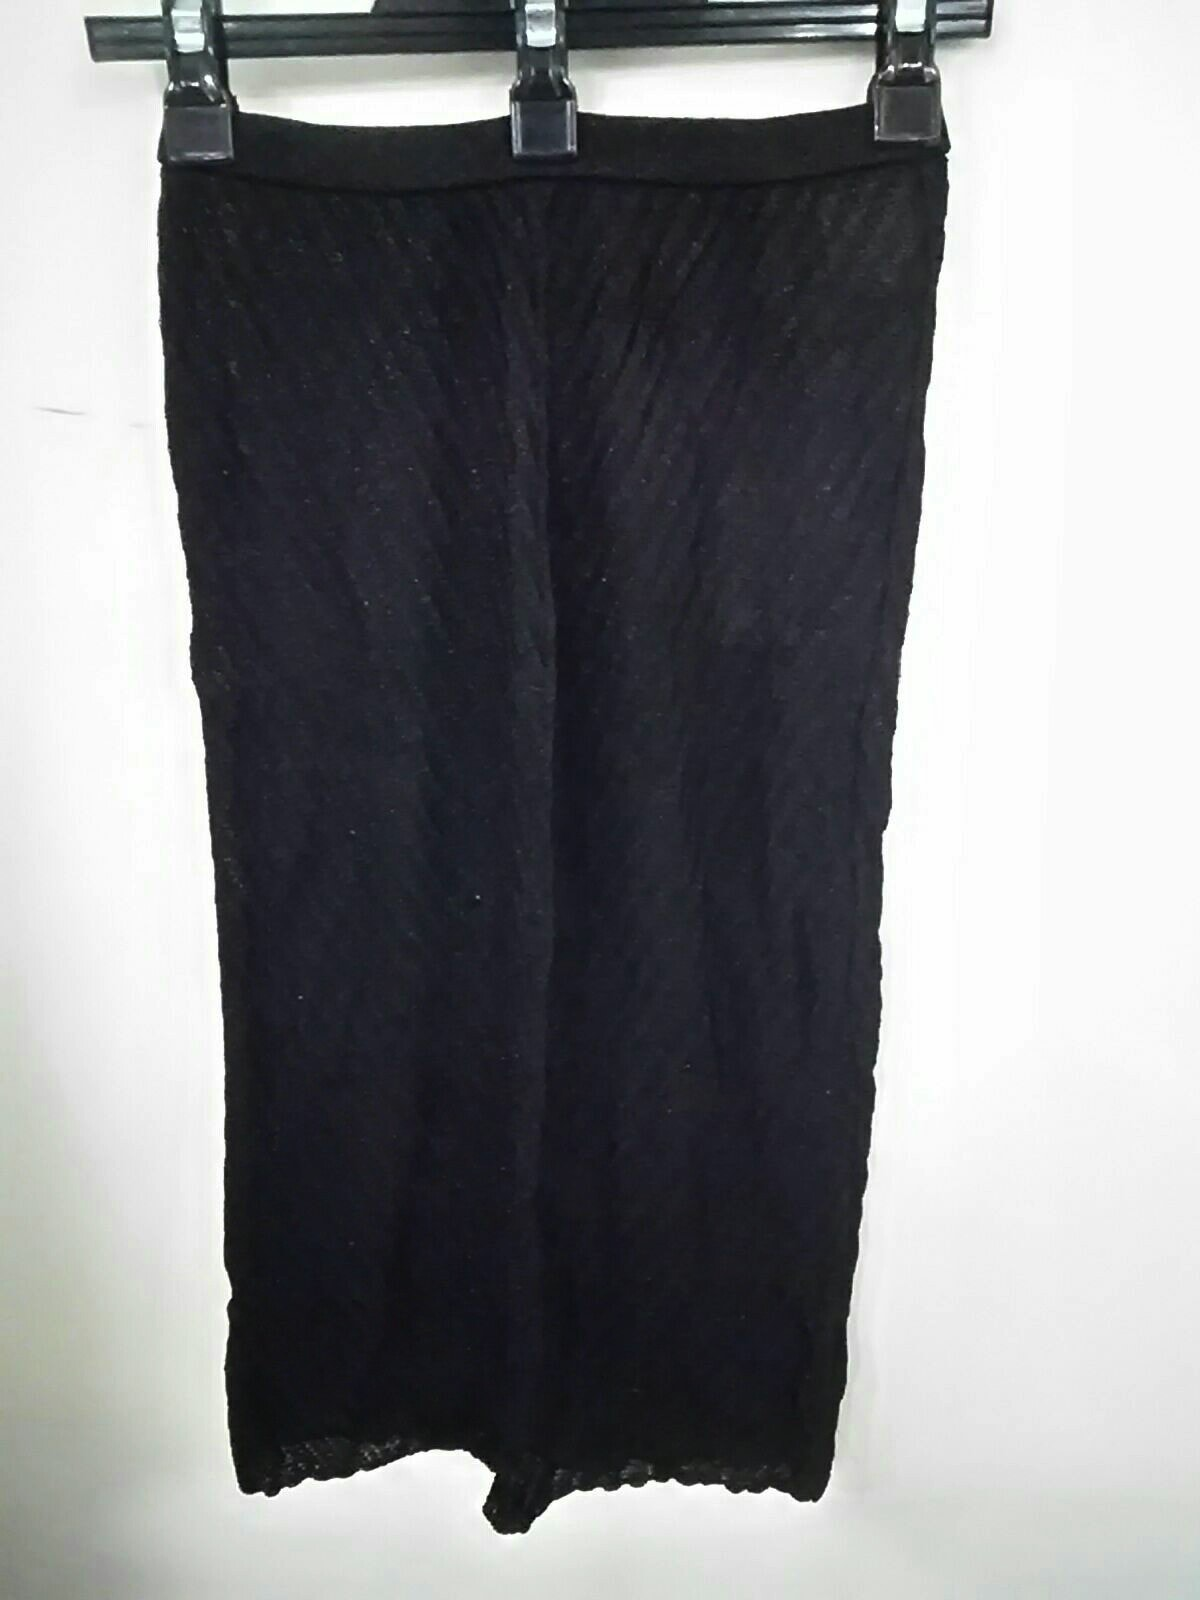 TENORAS LADOIES(ティノラス レディース)のスカート